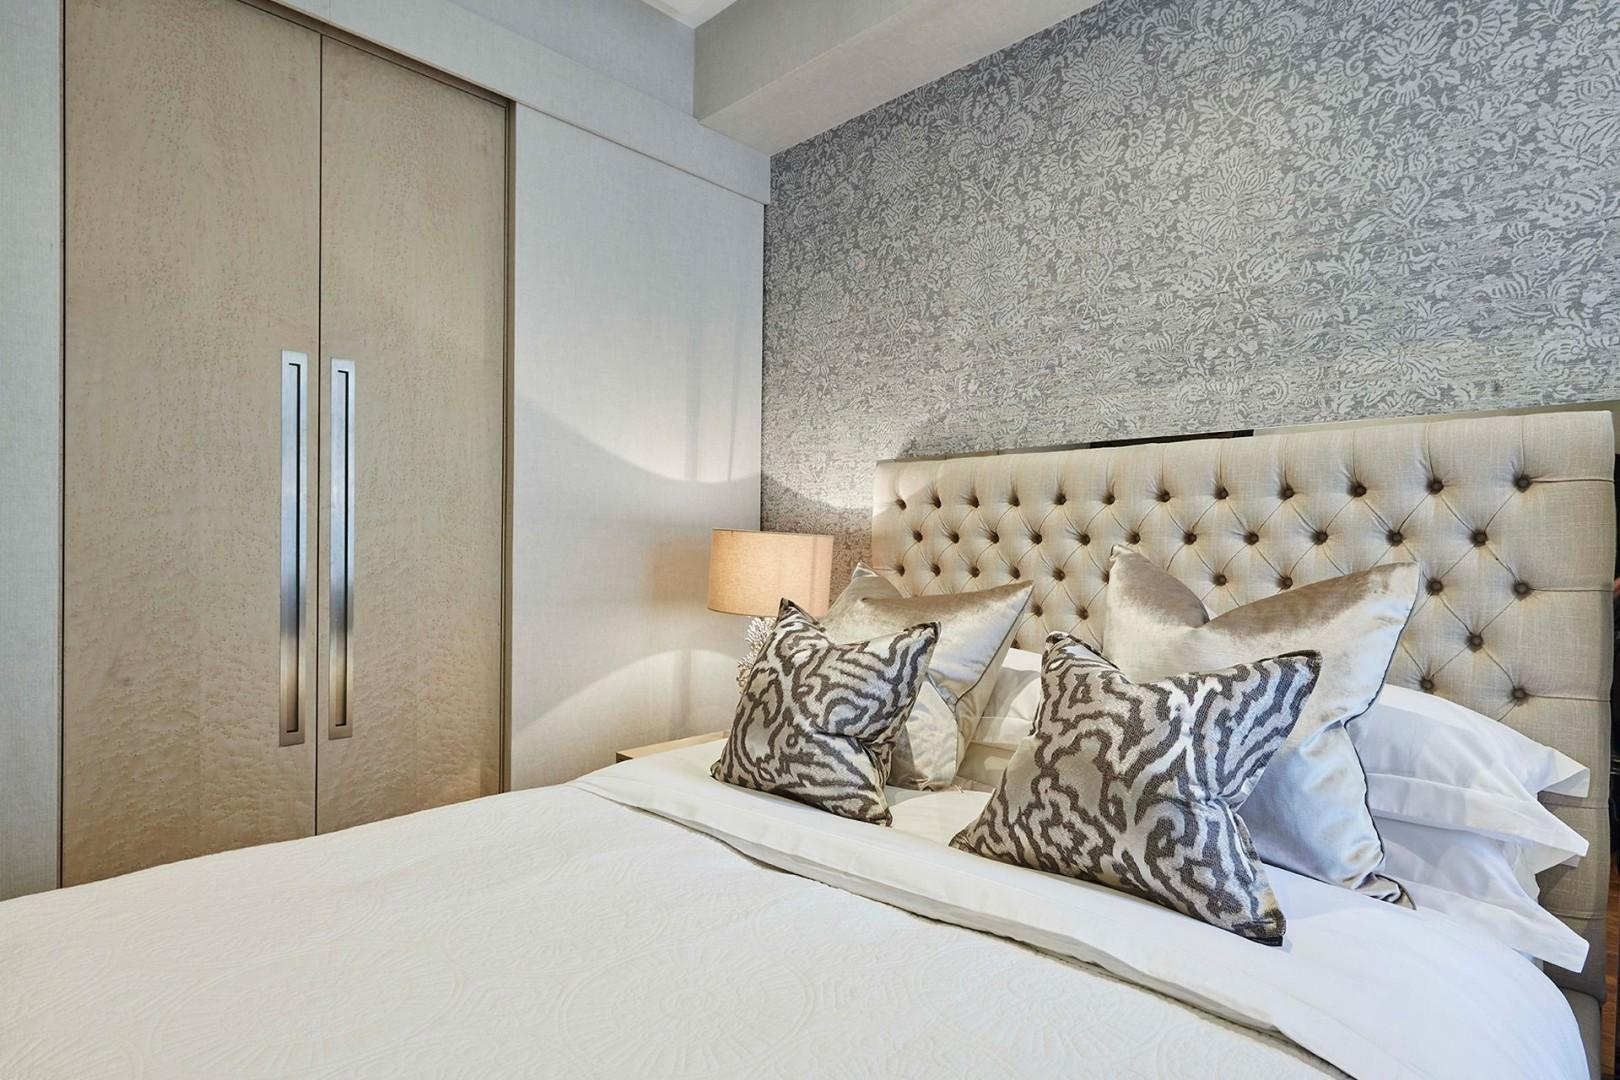 Walk-in closet in the second bedroom offers plentiful storage